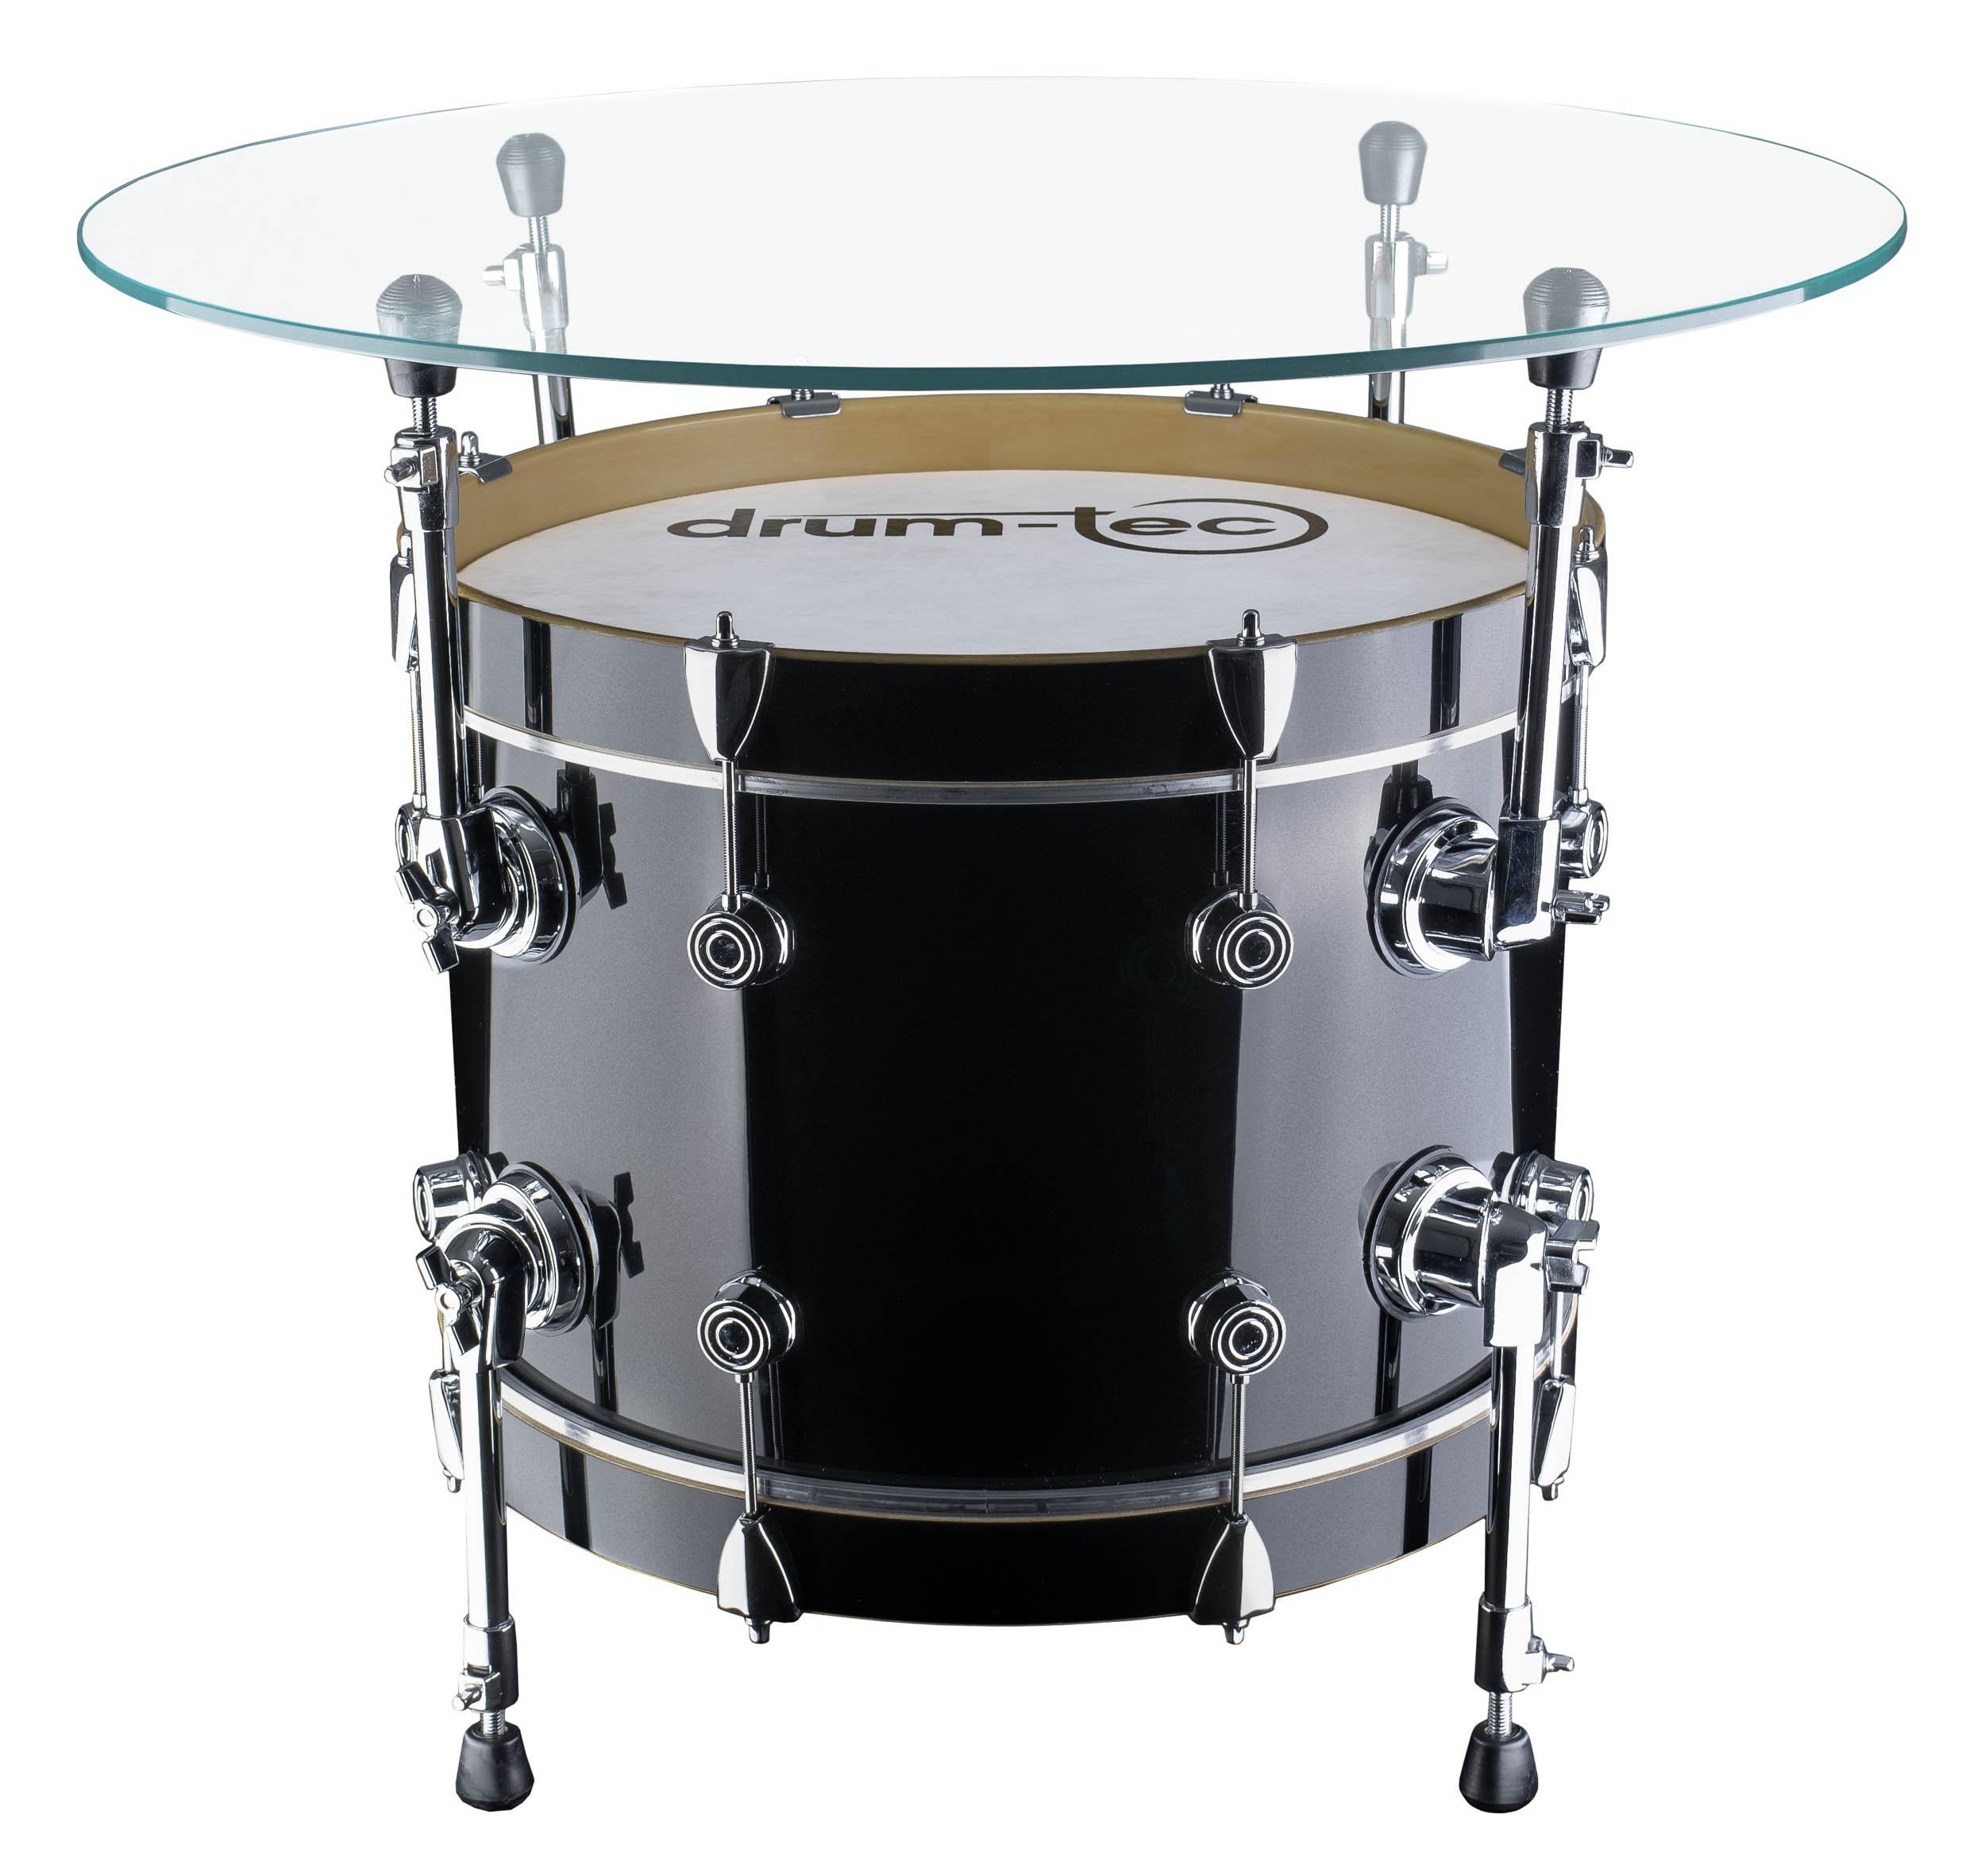 Chrome Drum Coffee Table: Drum-tec Bass Drum Coffee Table